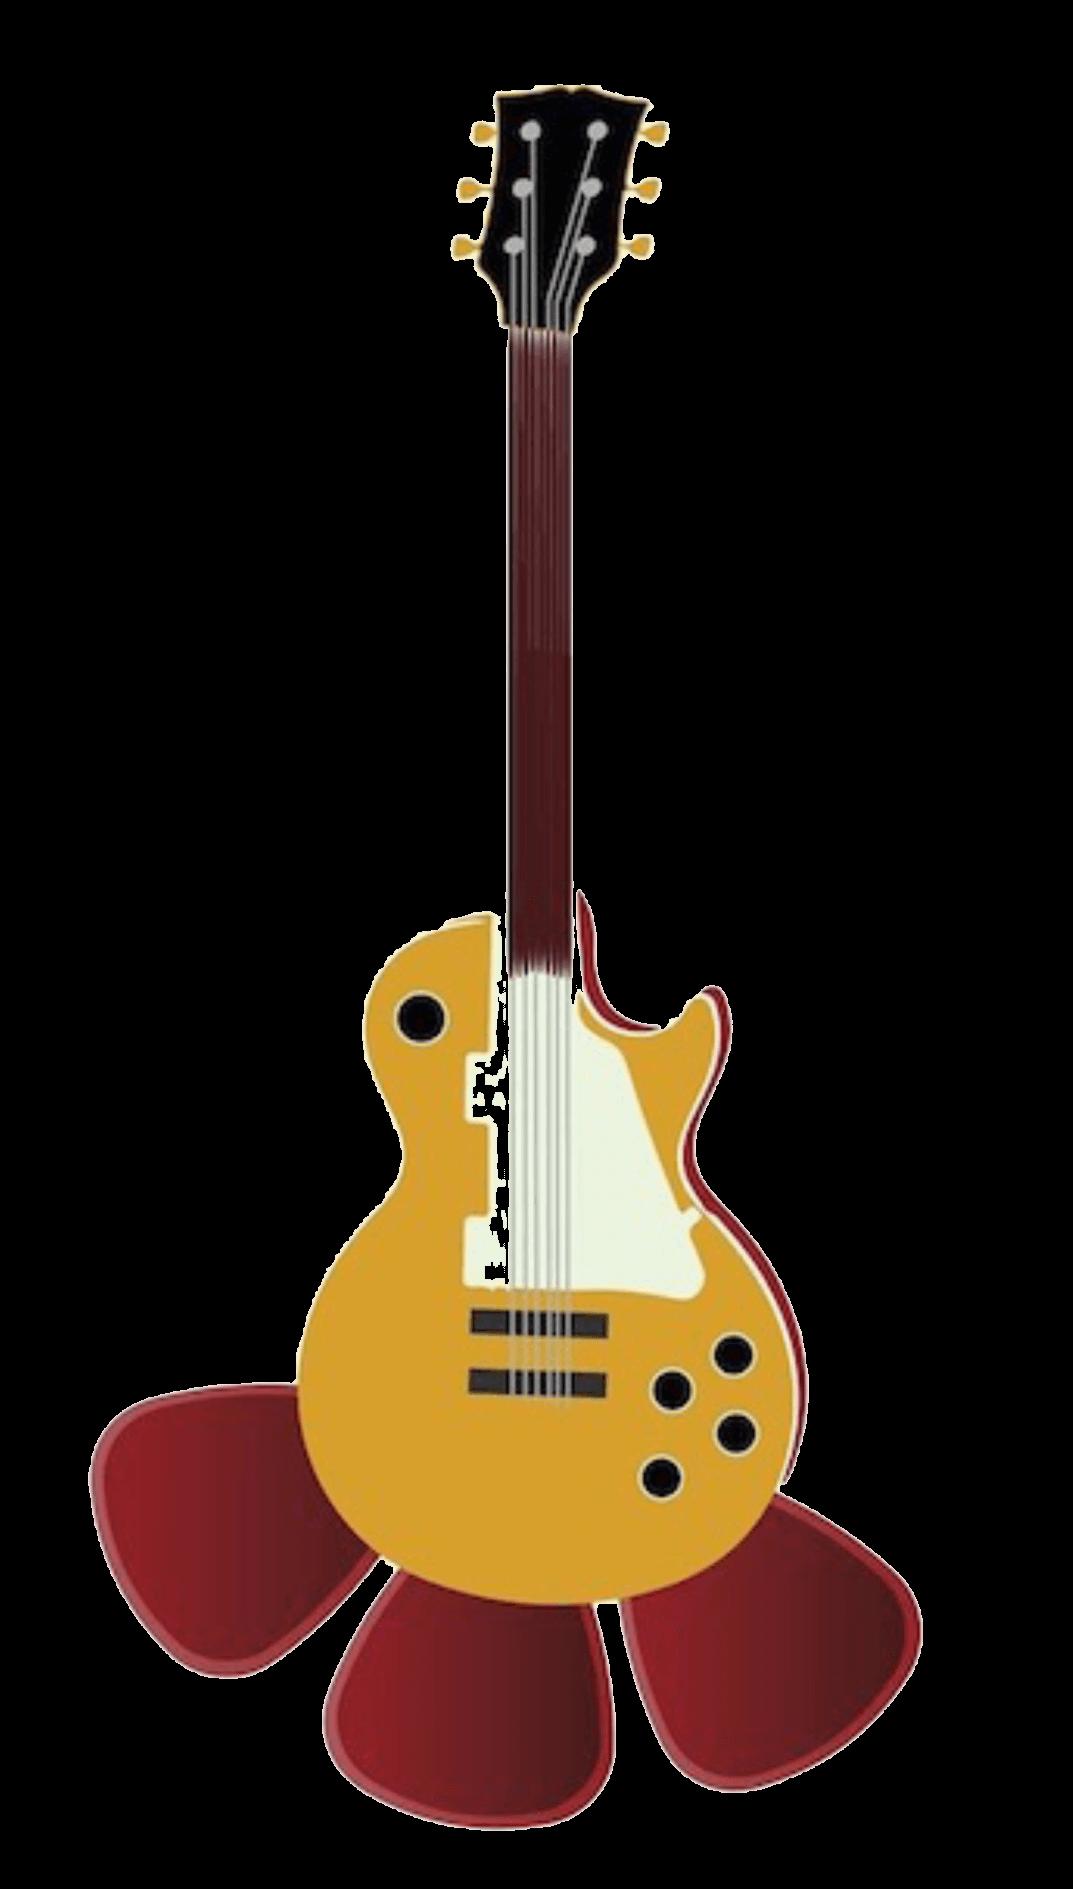 Musikschule Gitarrenliebe bekommt eine neue Homepage